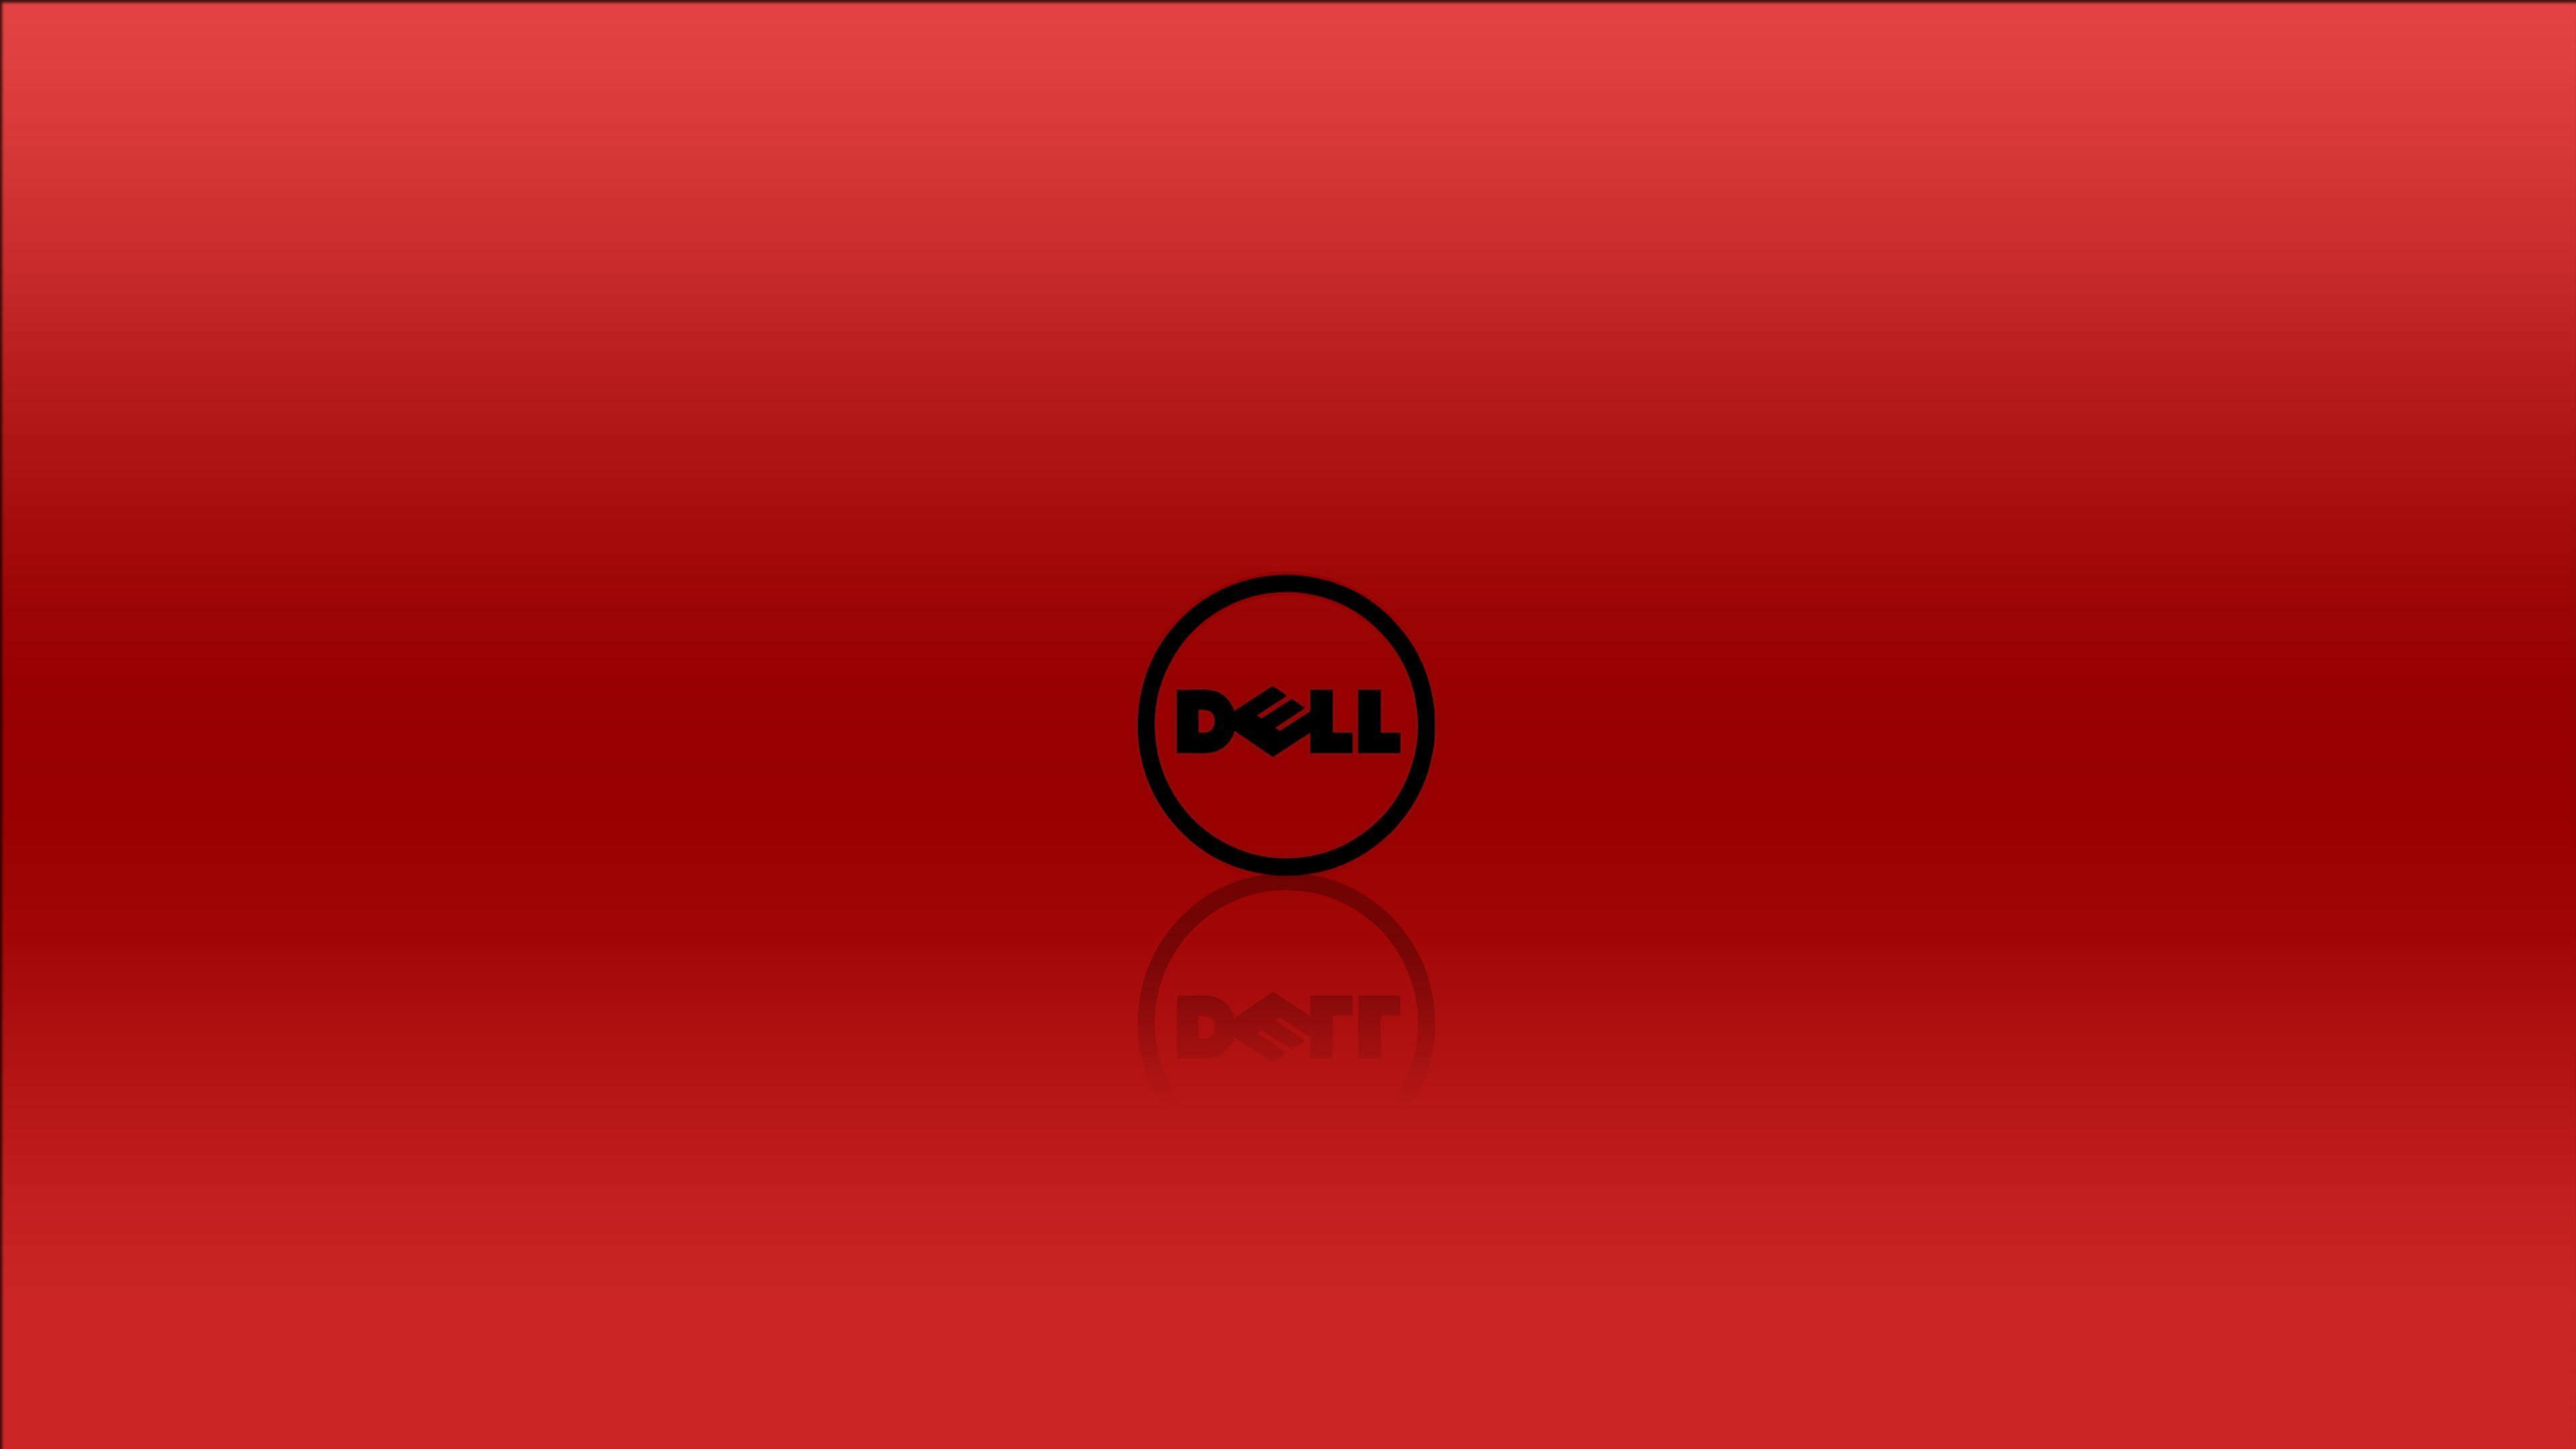 Dell Gamer 4K Wallpapers   Top Dell Gamer 4K Backgrounds 3840x2160